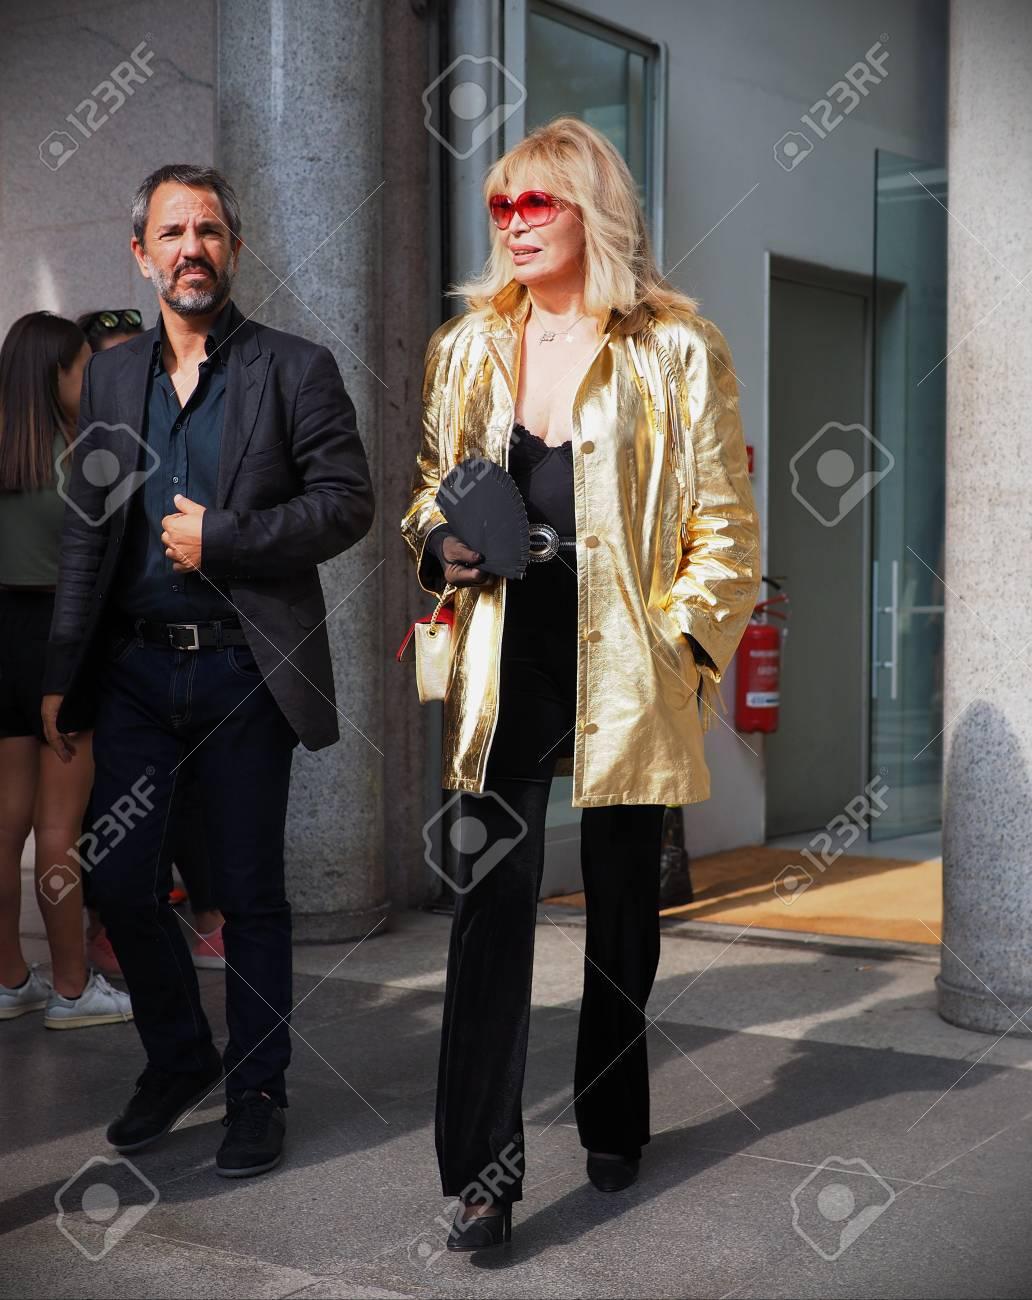 Amanda Lear Photos milan, italy: september 22, 2018: amanda lear streetstyle outfit..